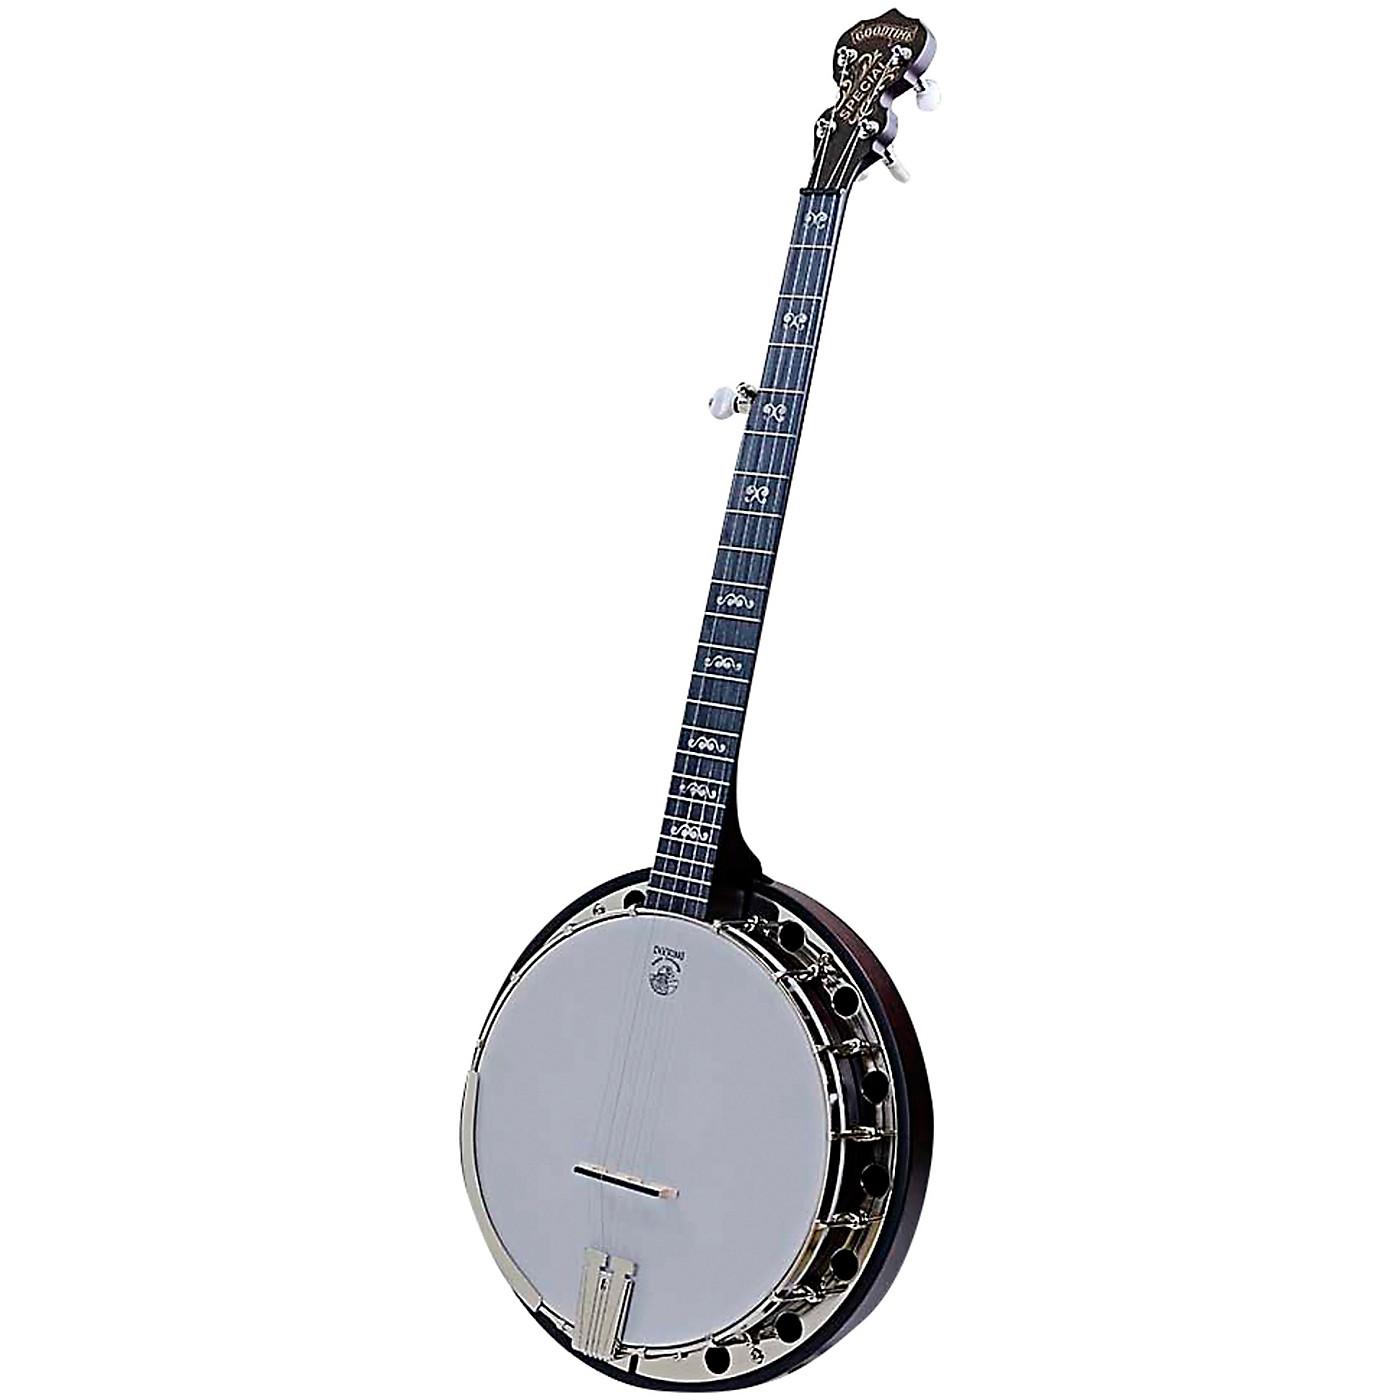 Deering Artisan Goodtime Special 5-String Resonator Banjo thumbnail